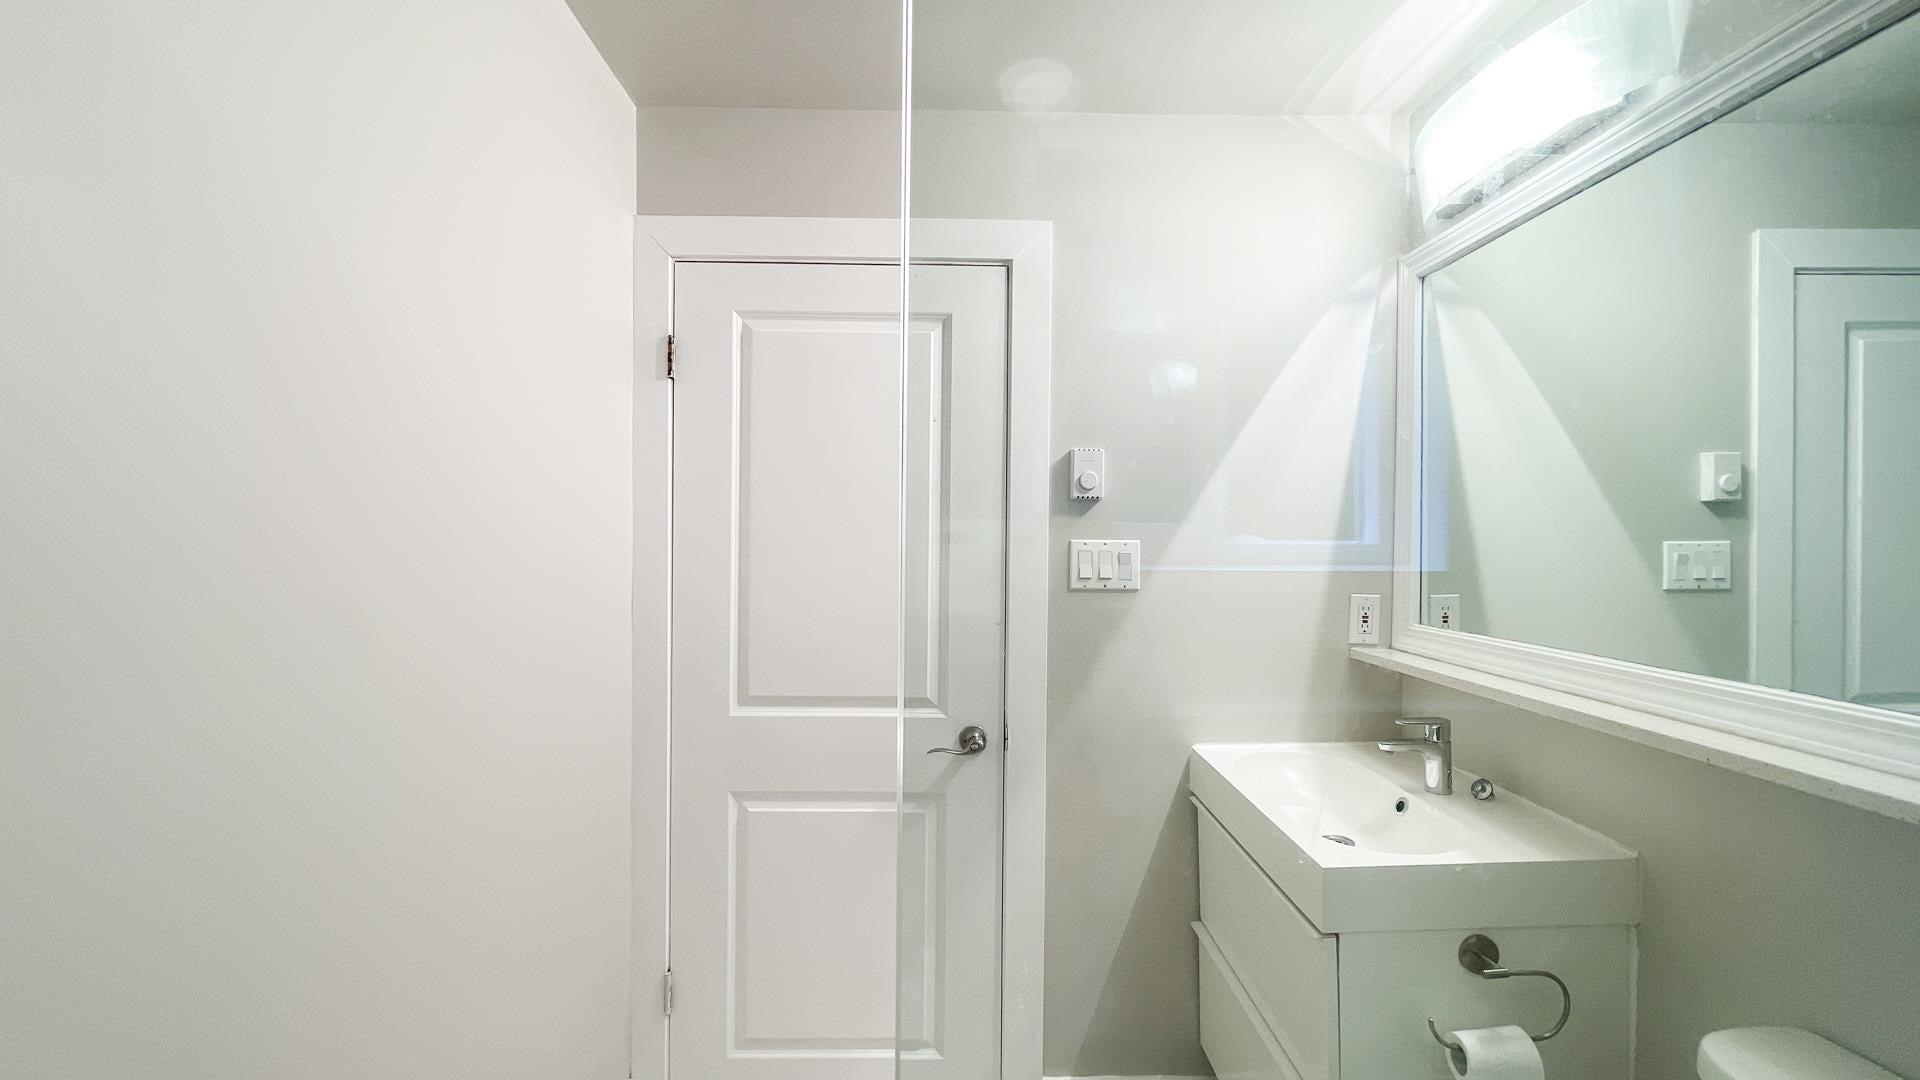 1168 JEFFERSON AVENUE - Ambleside House/Single Family for sale, 6 Bedrooms (R2602275) - #24